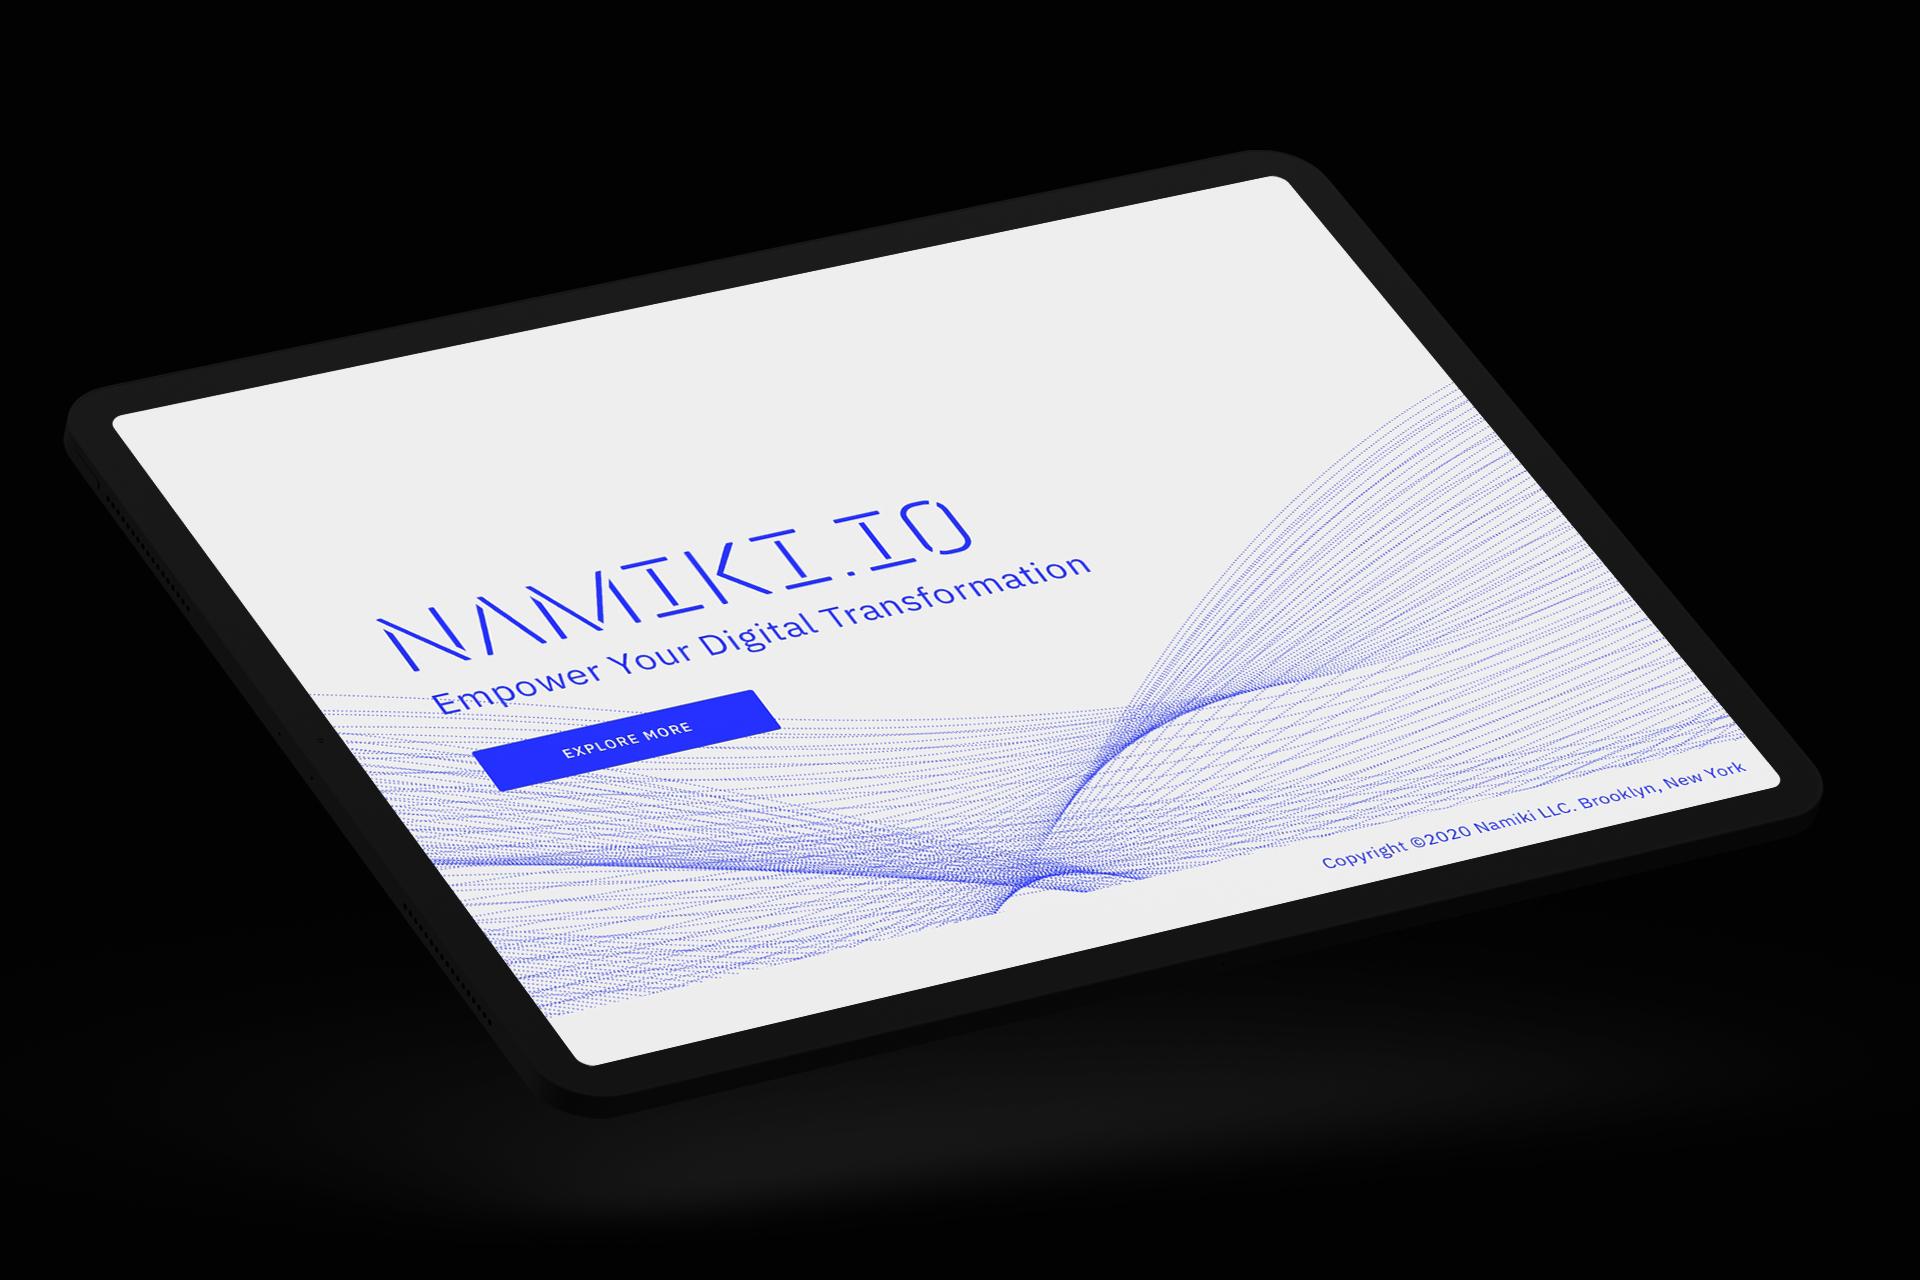 marco-stoermer-vitae-namiki-01